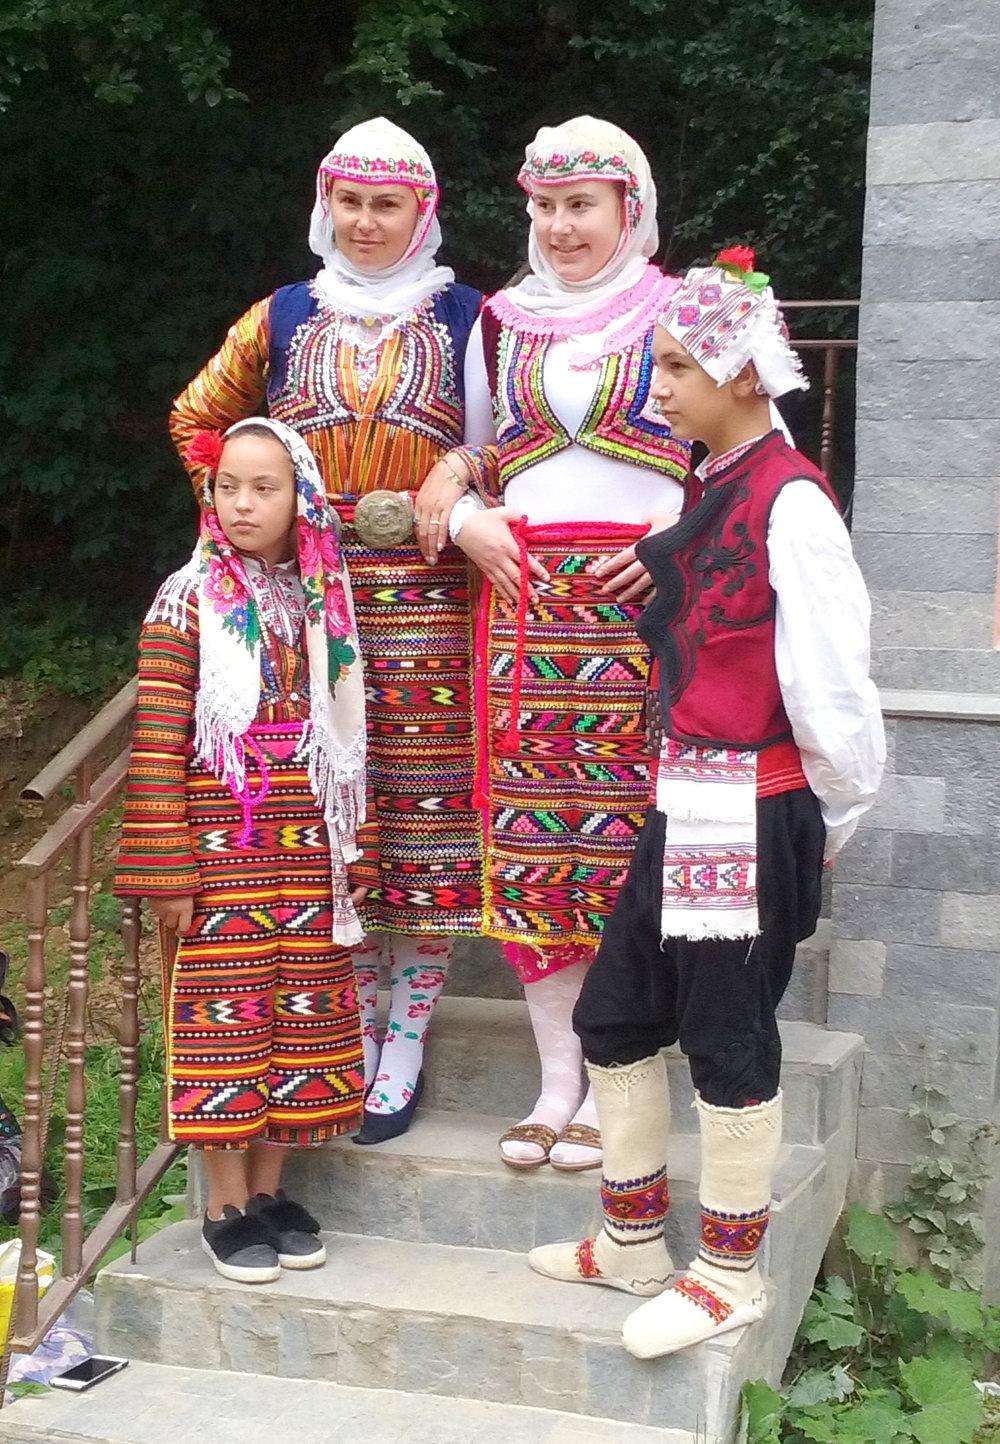 From Bulgaria with Love: - Roses, Rakiya & Song